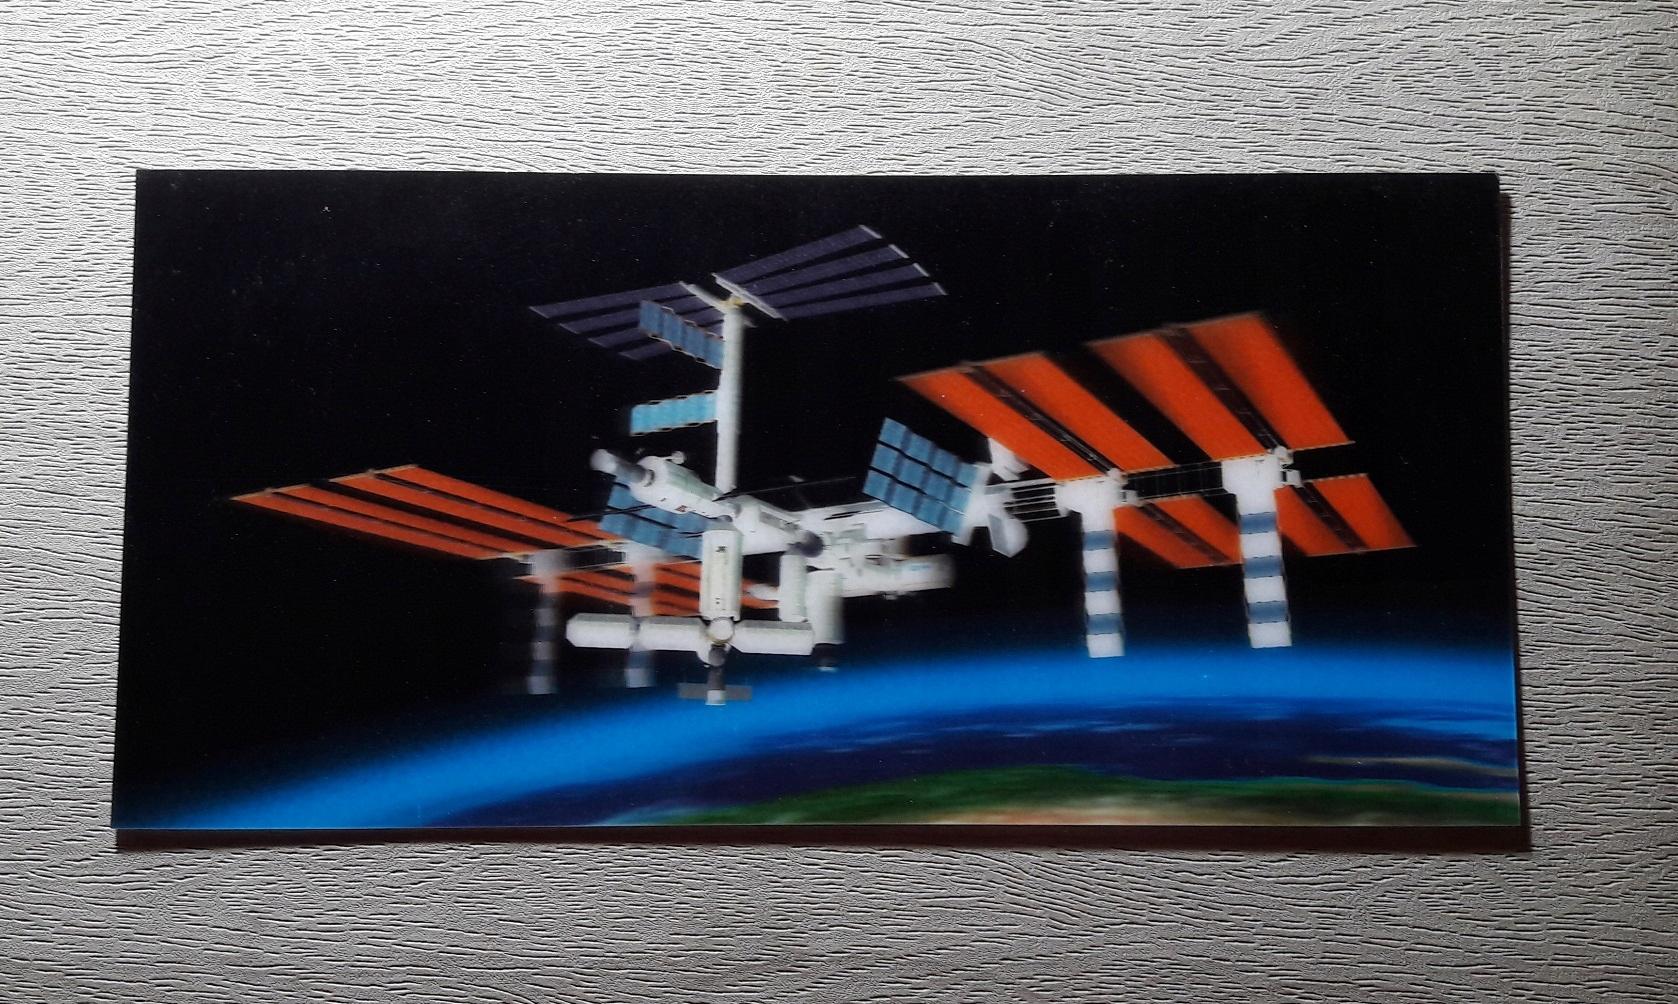 Космическая космическая станция трехмерная 3D открытка